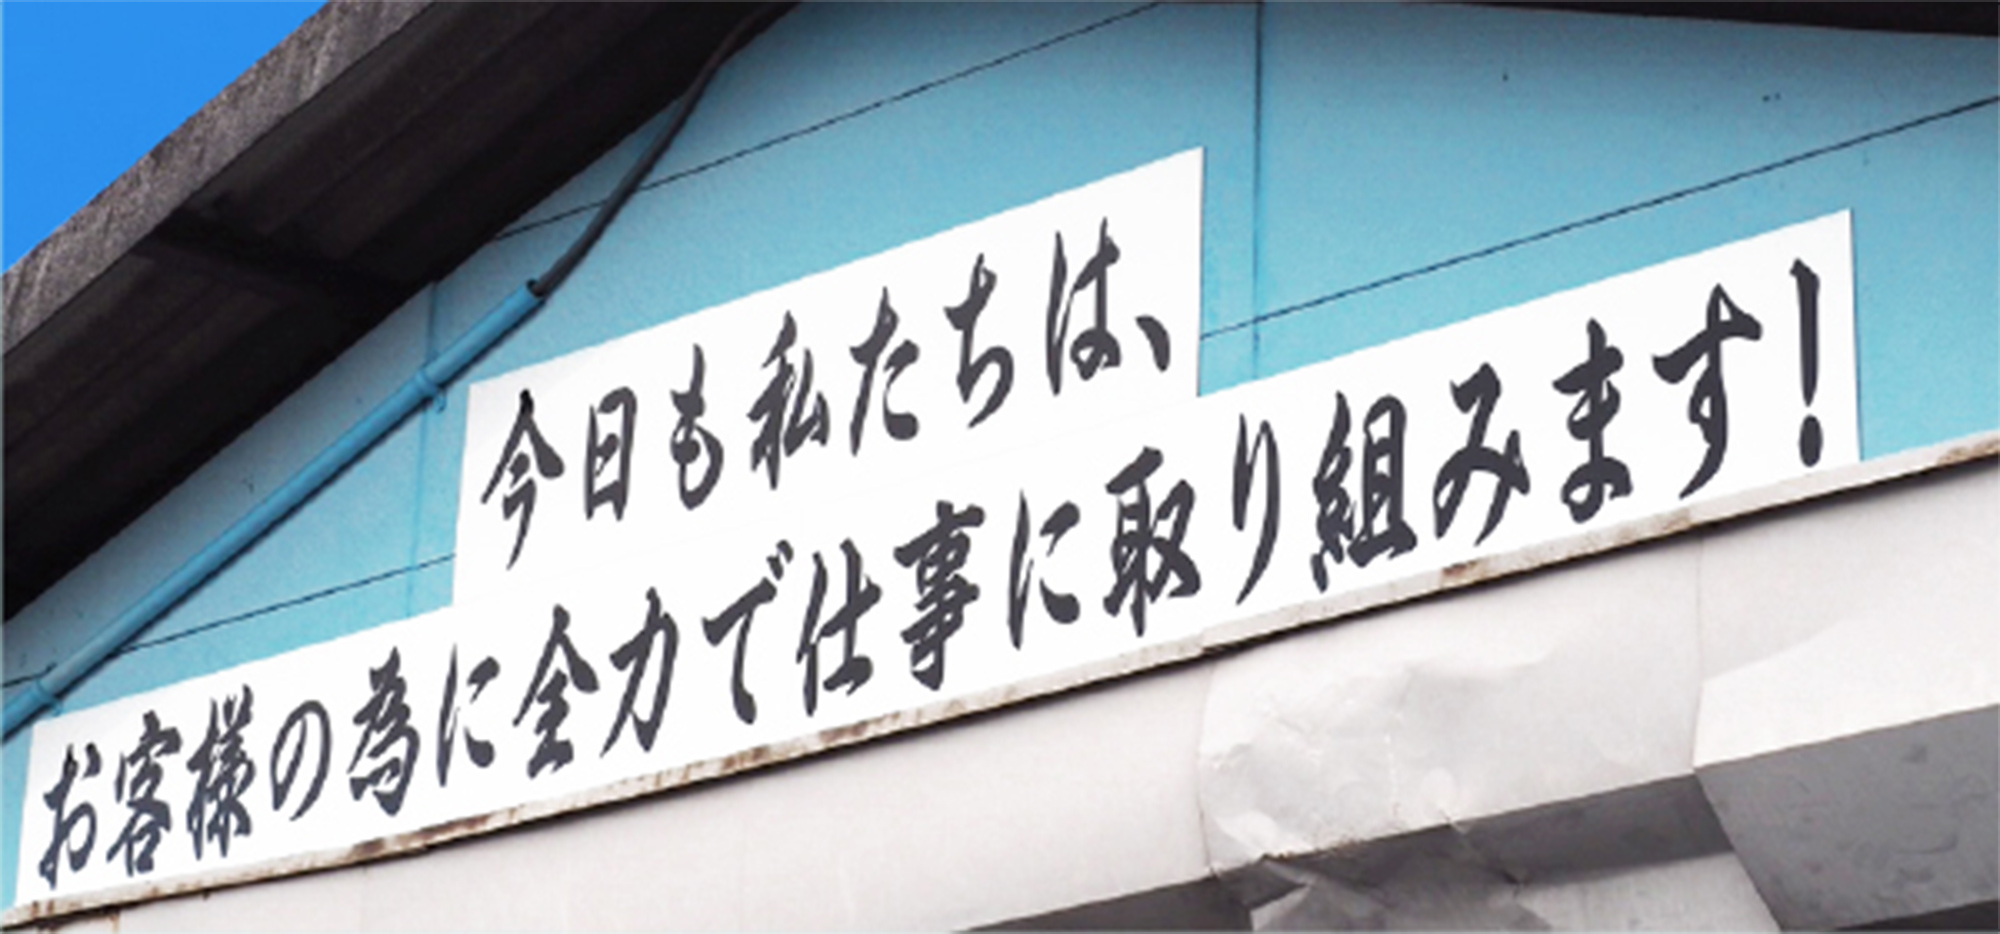 Philosophy 企業理念